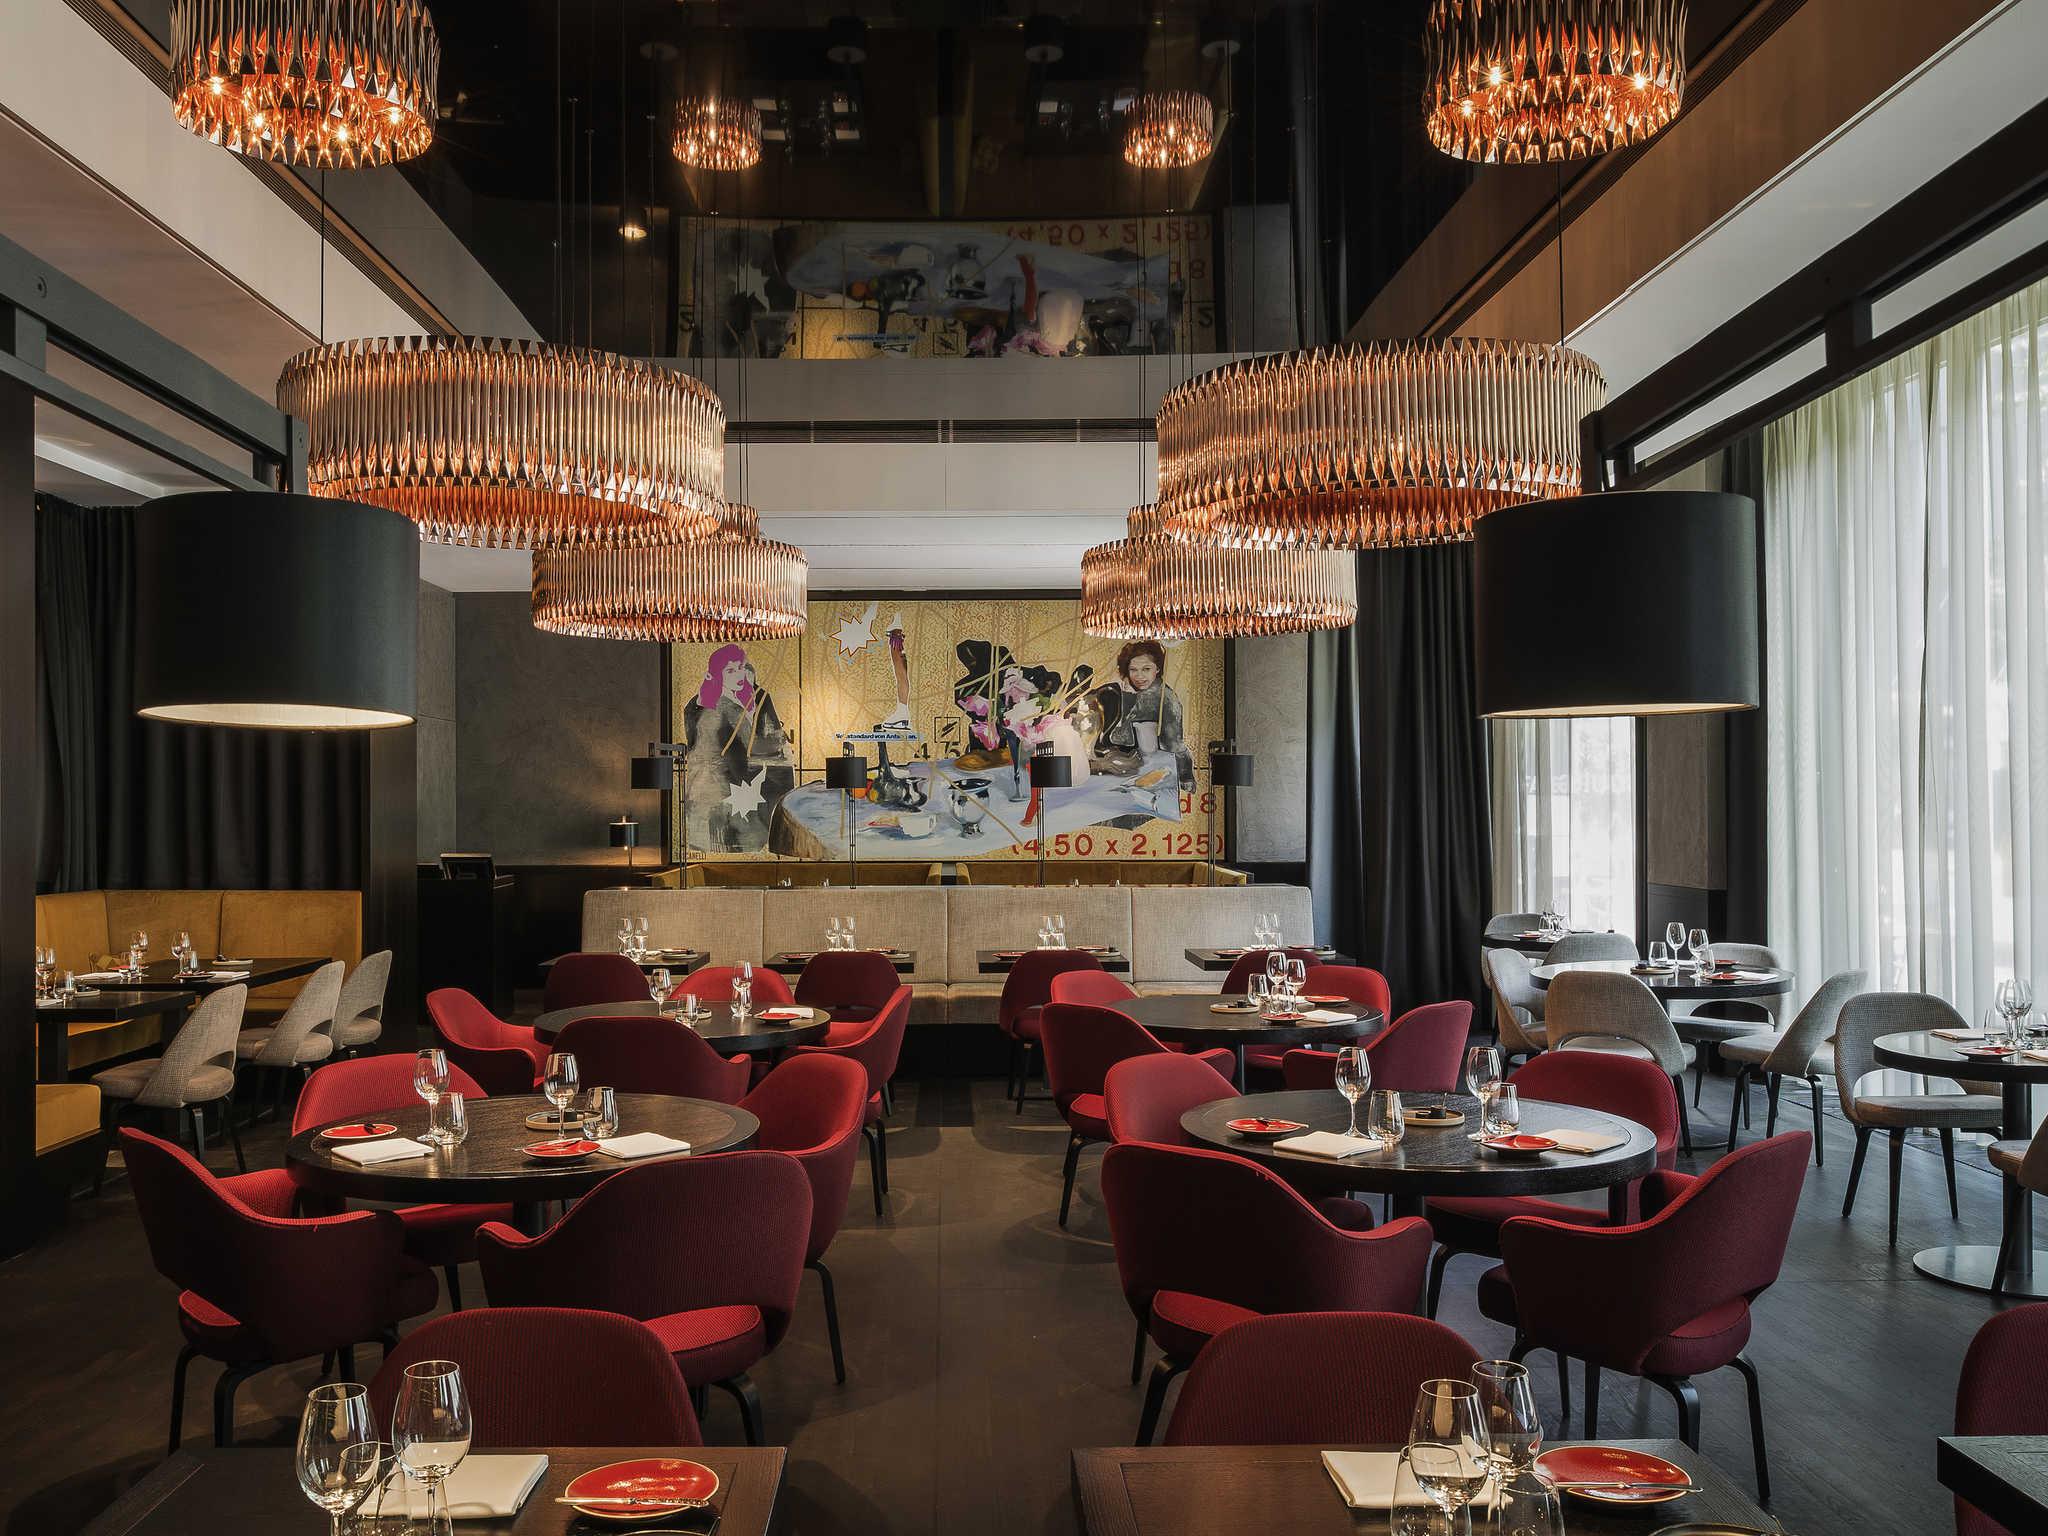 Hotel – Sofitel Berlín Kurfurdtendamm